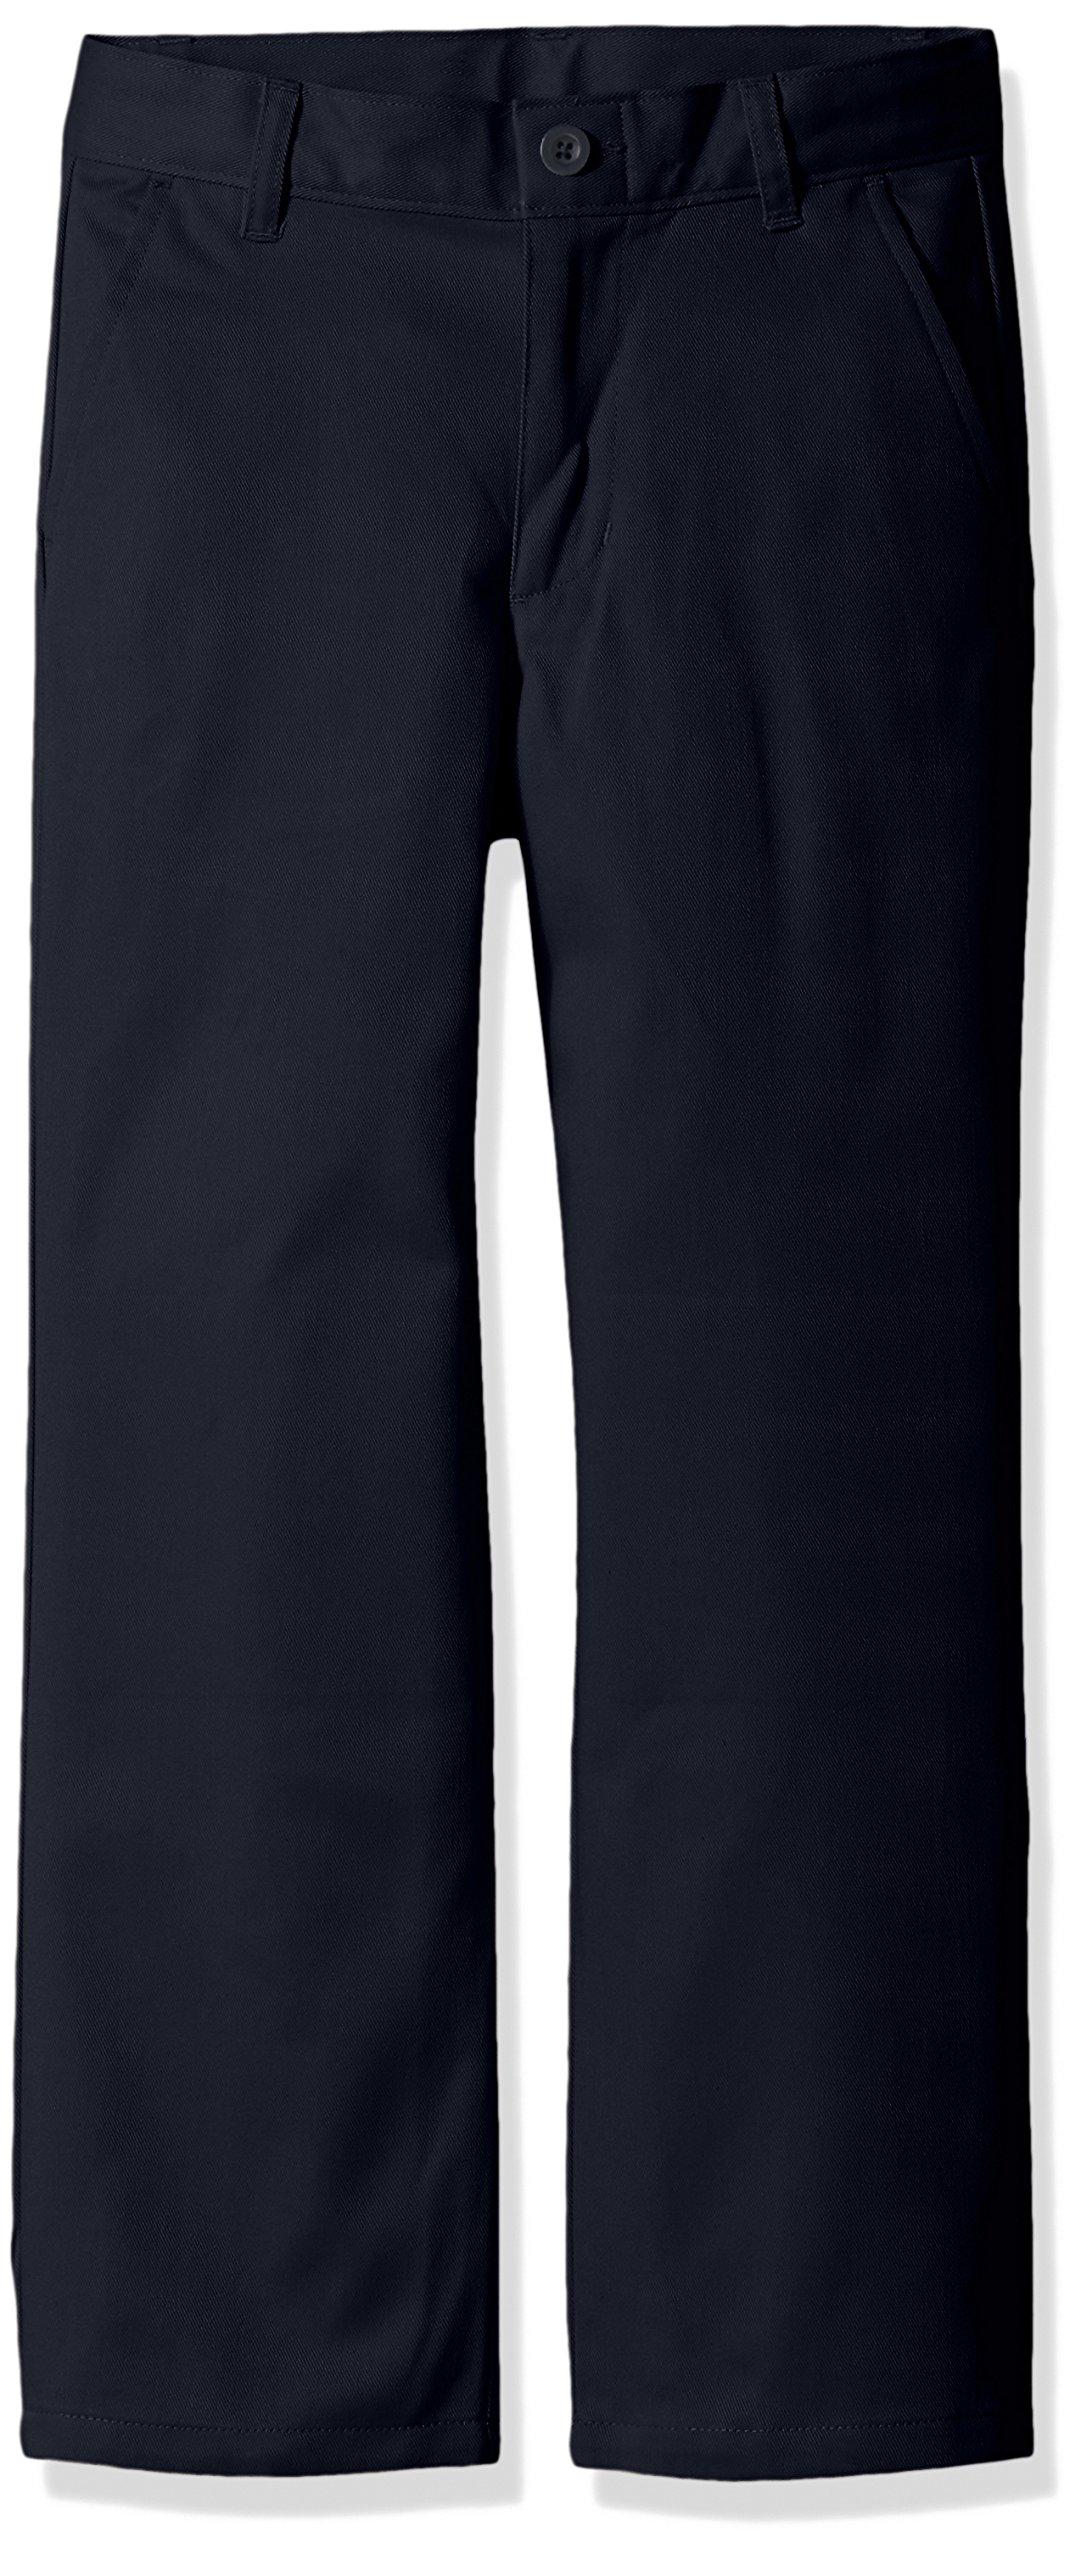 Dockers Boys' Big Uniform Twill Pants, Navy, 08